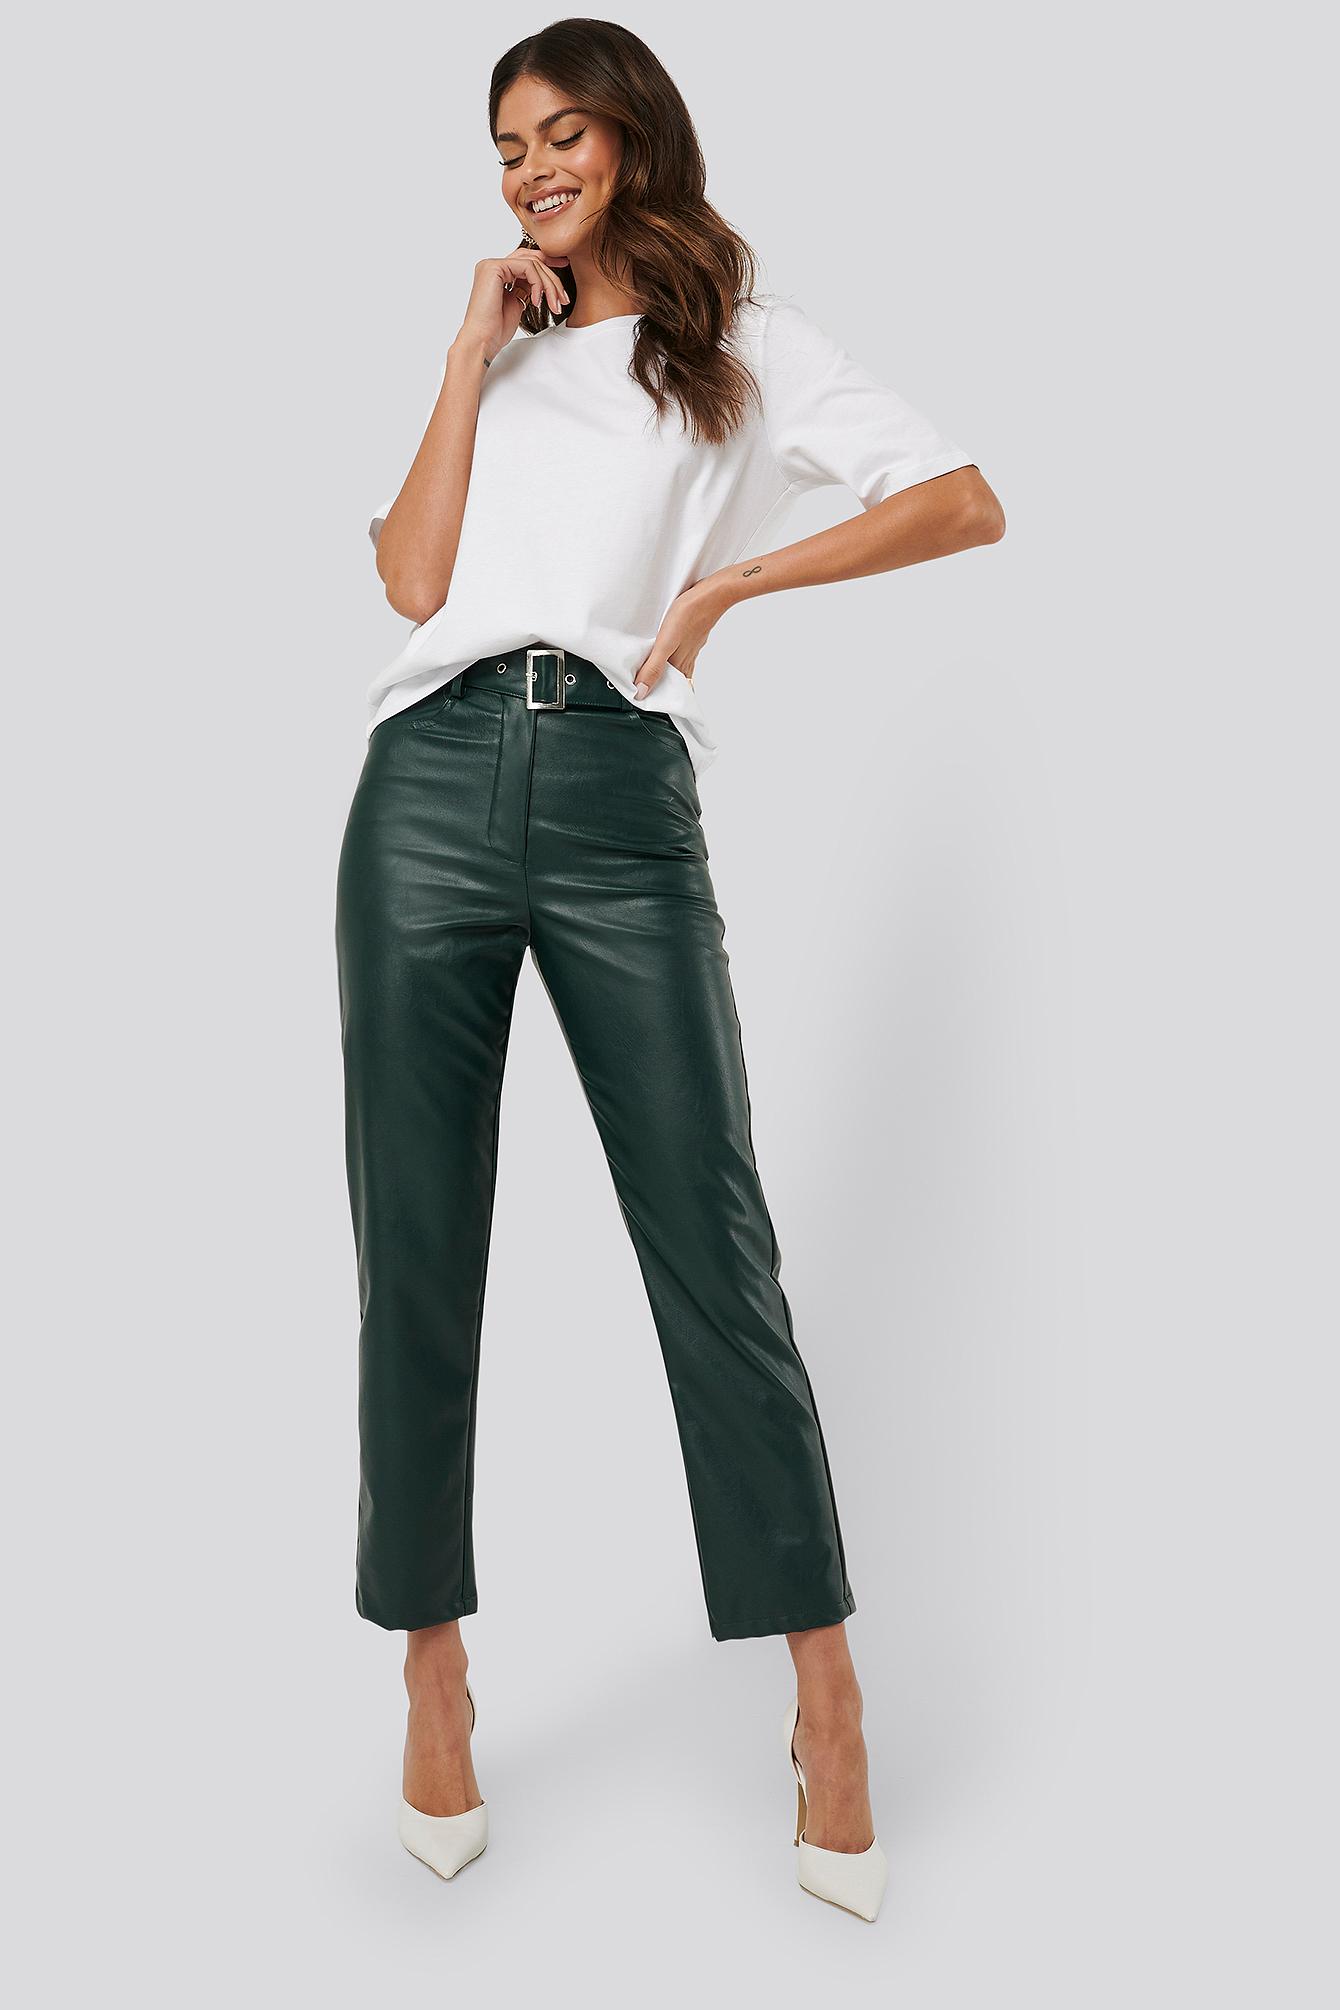 afj x na-kd -  Belted Pu Leather Pants - Green